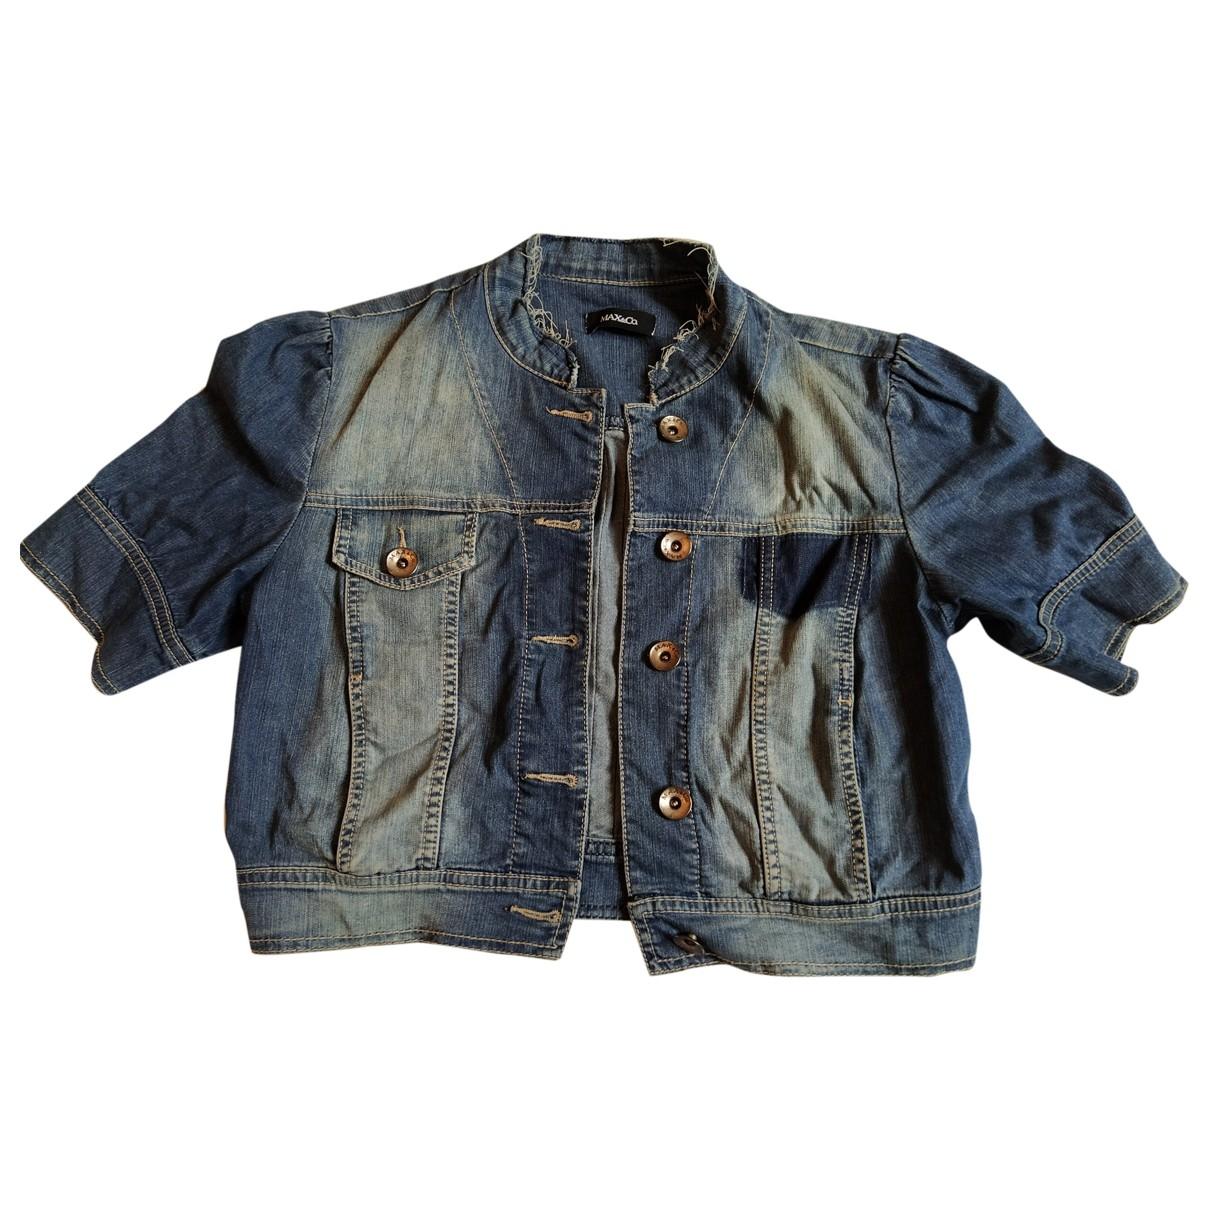 Max & Co \N Jacke in Denim - Jeans